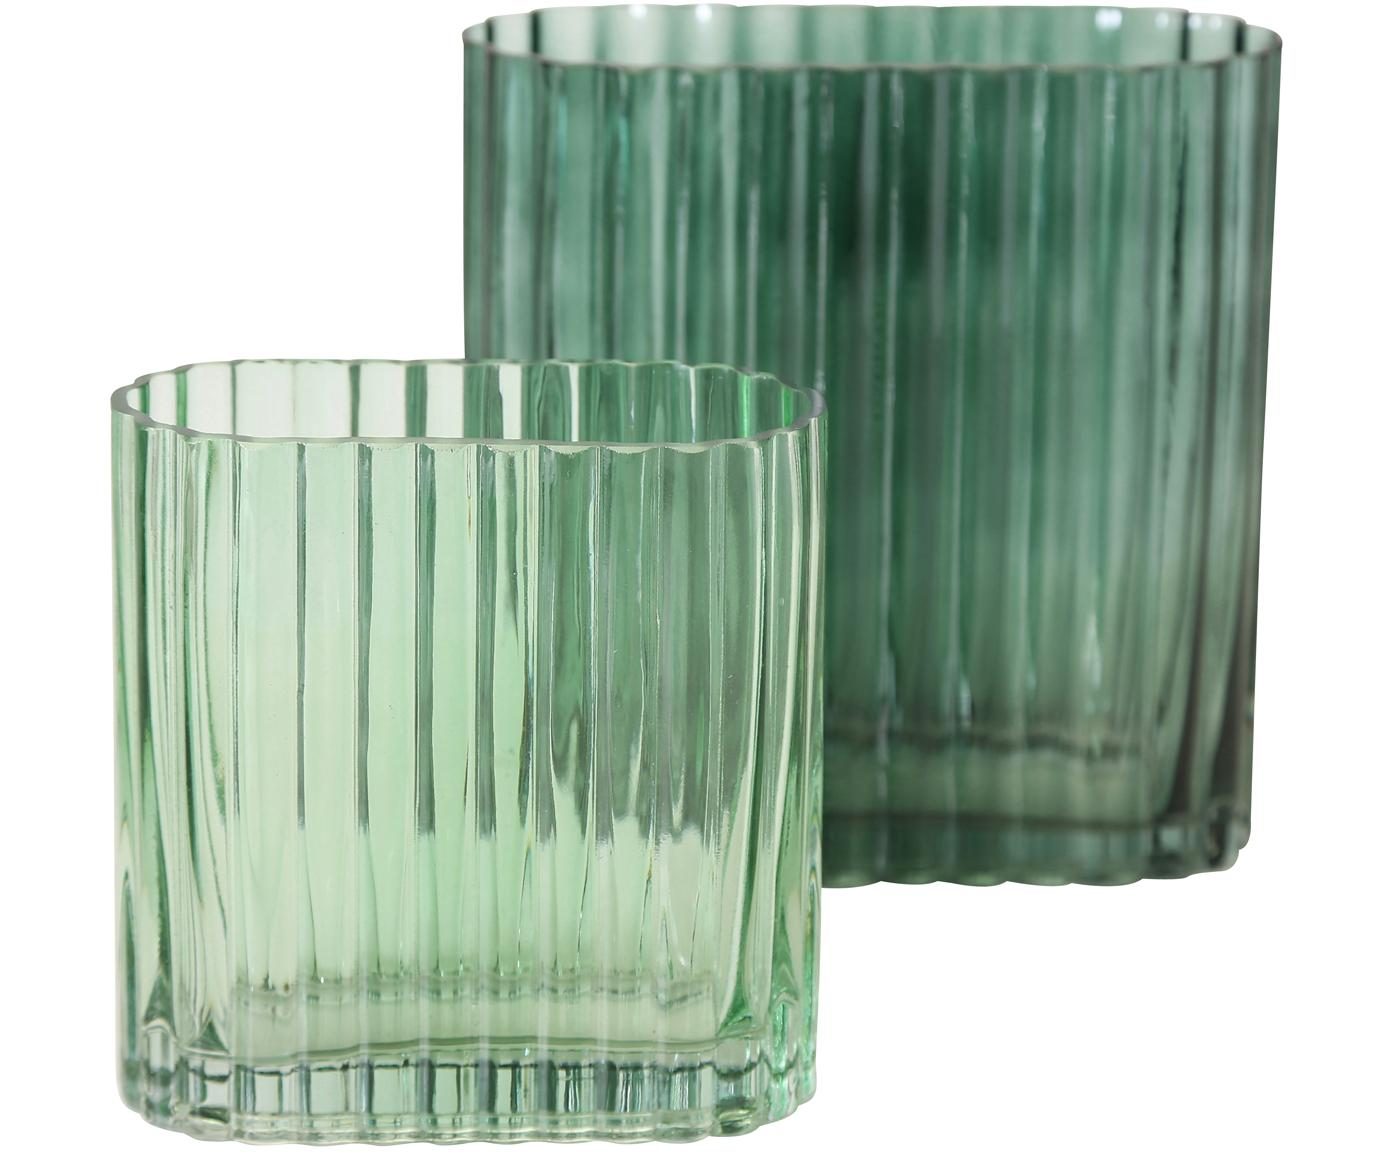 Glas-Vasen-Set Tulipa, 2-tlg., Glas, Grün, Sondergrößen